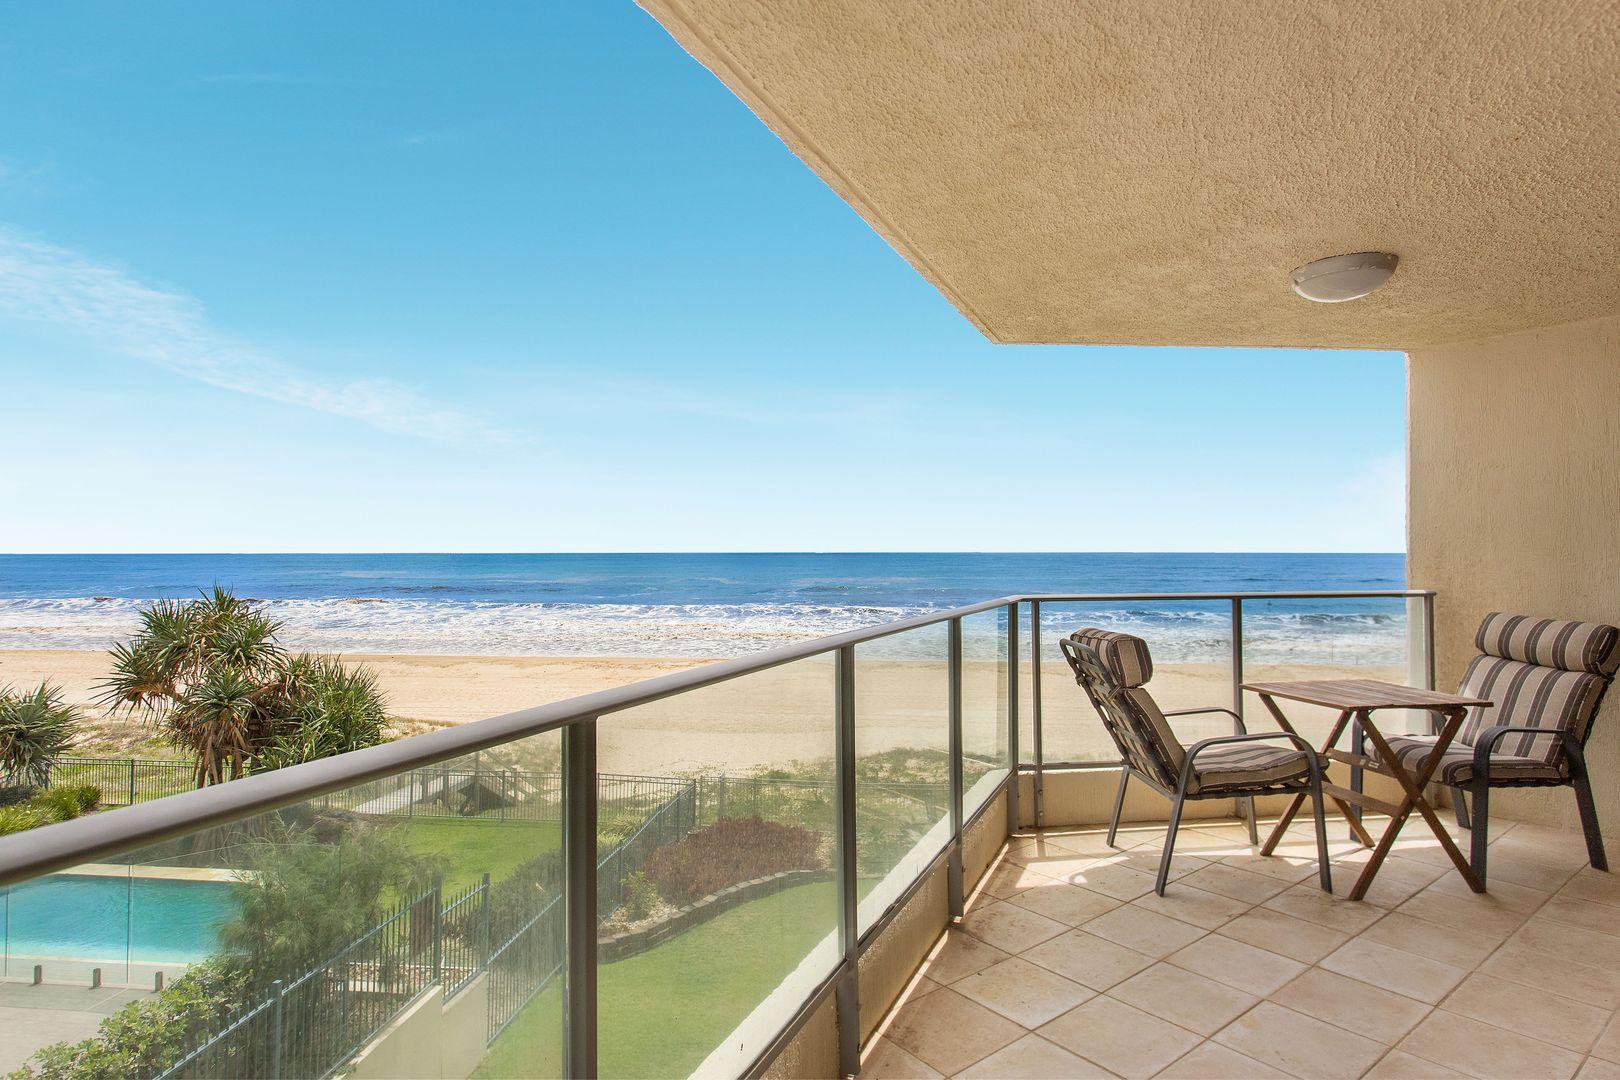 6/67 Albatross Avenue, Mermaid Beach QLD 4218, Image 1